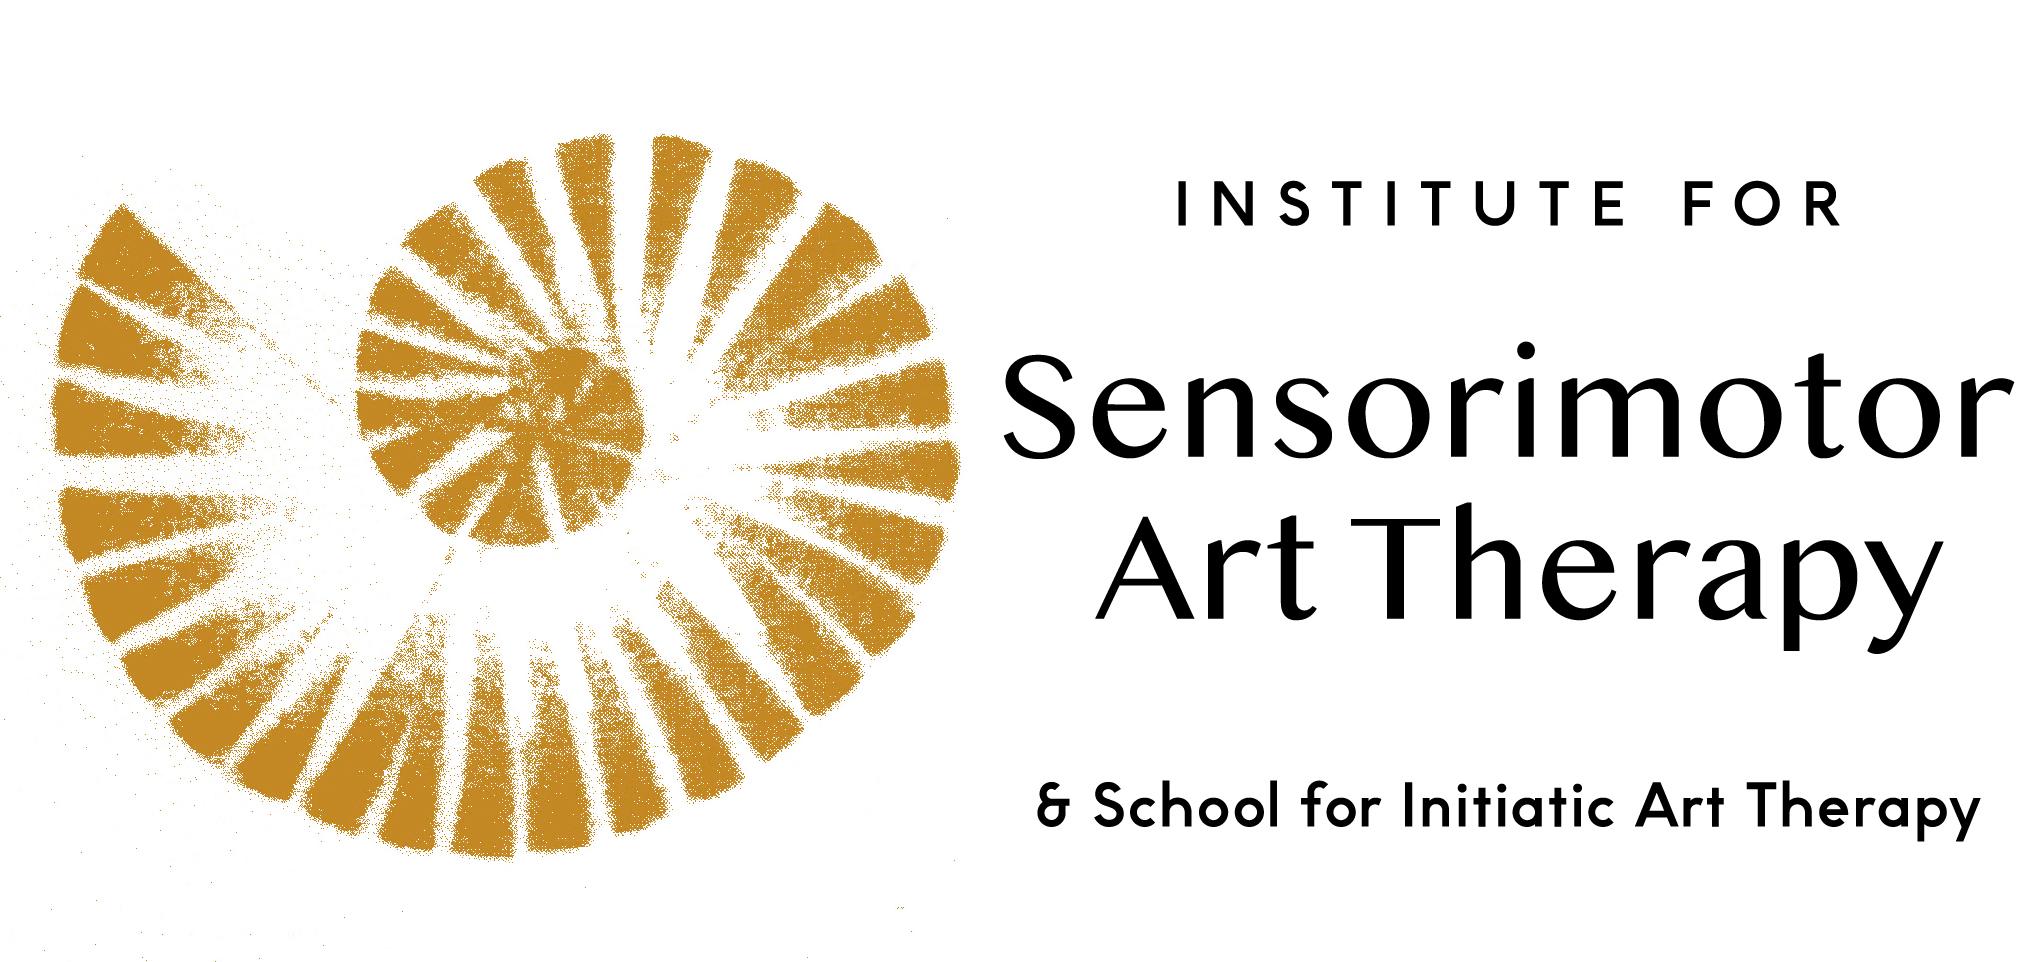 Institute for Sensorimotor Art Therapy